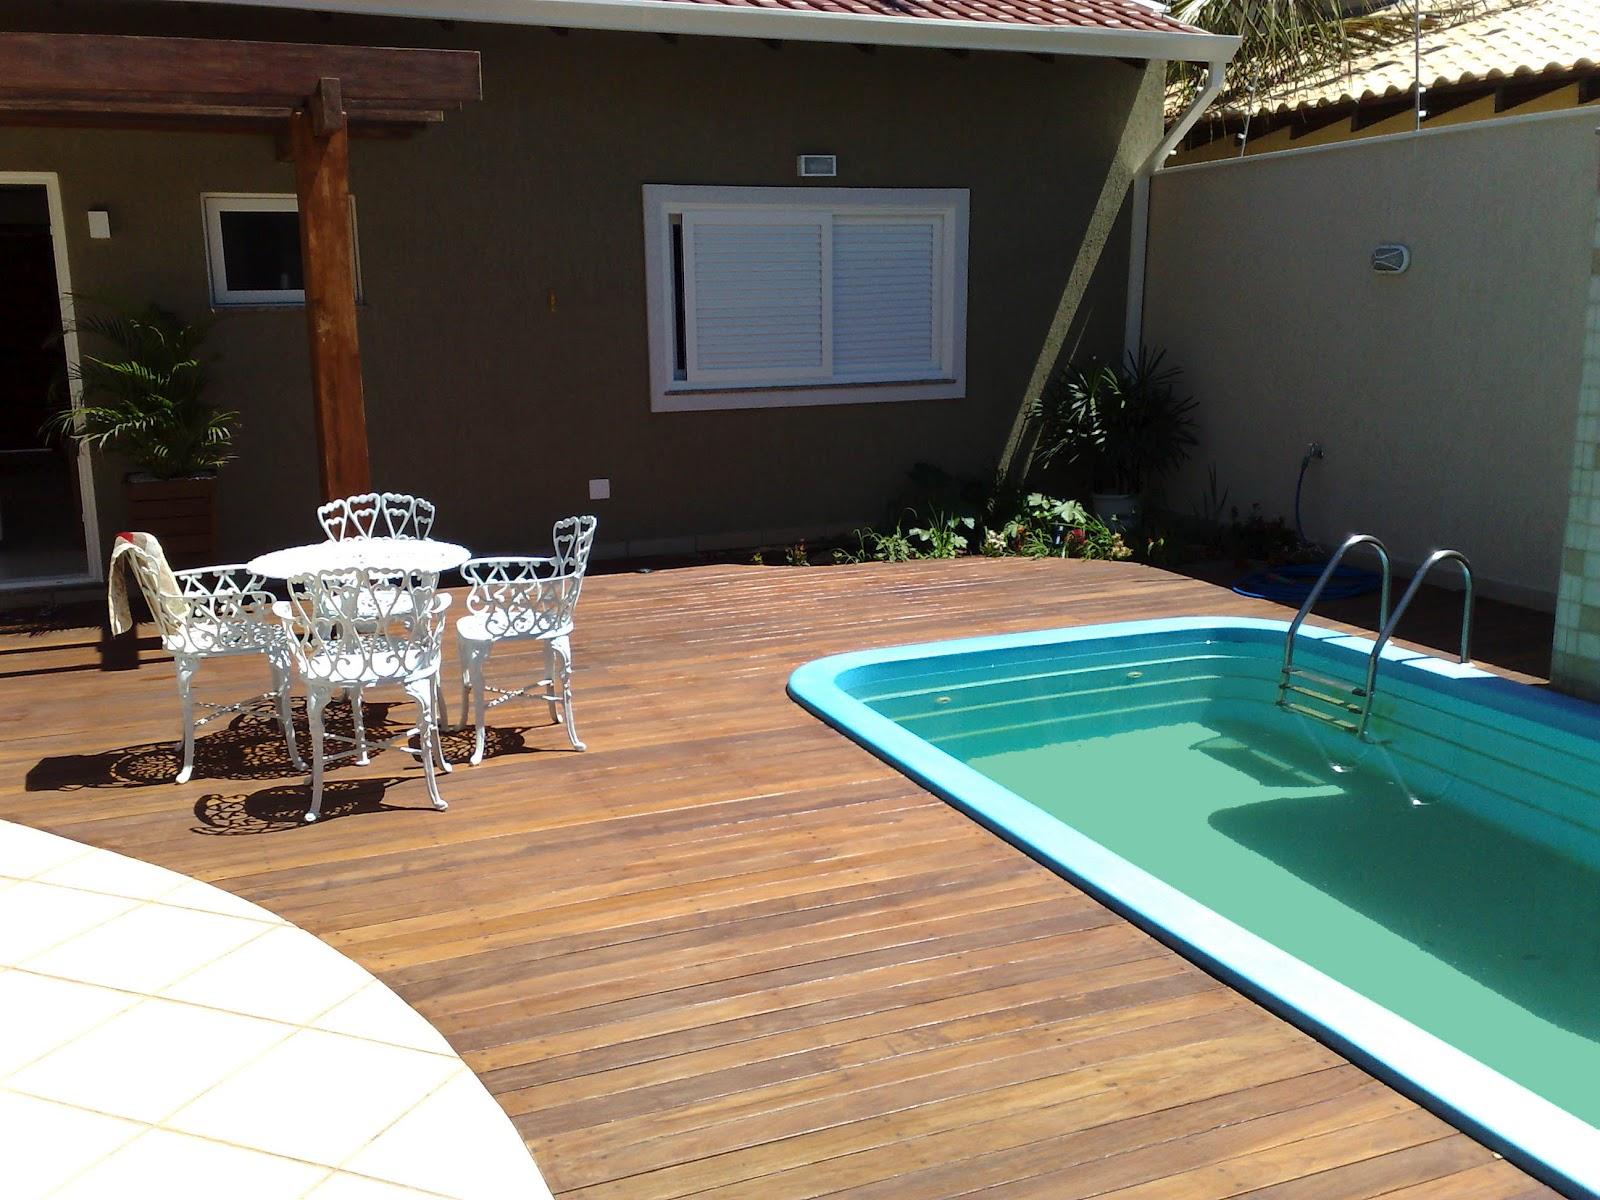 Deck para piscina em joinville deck para piscina for De k piscina